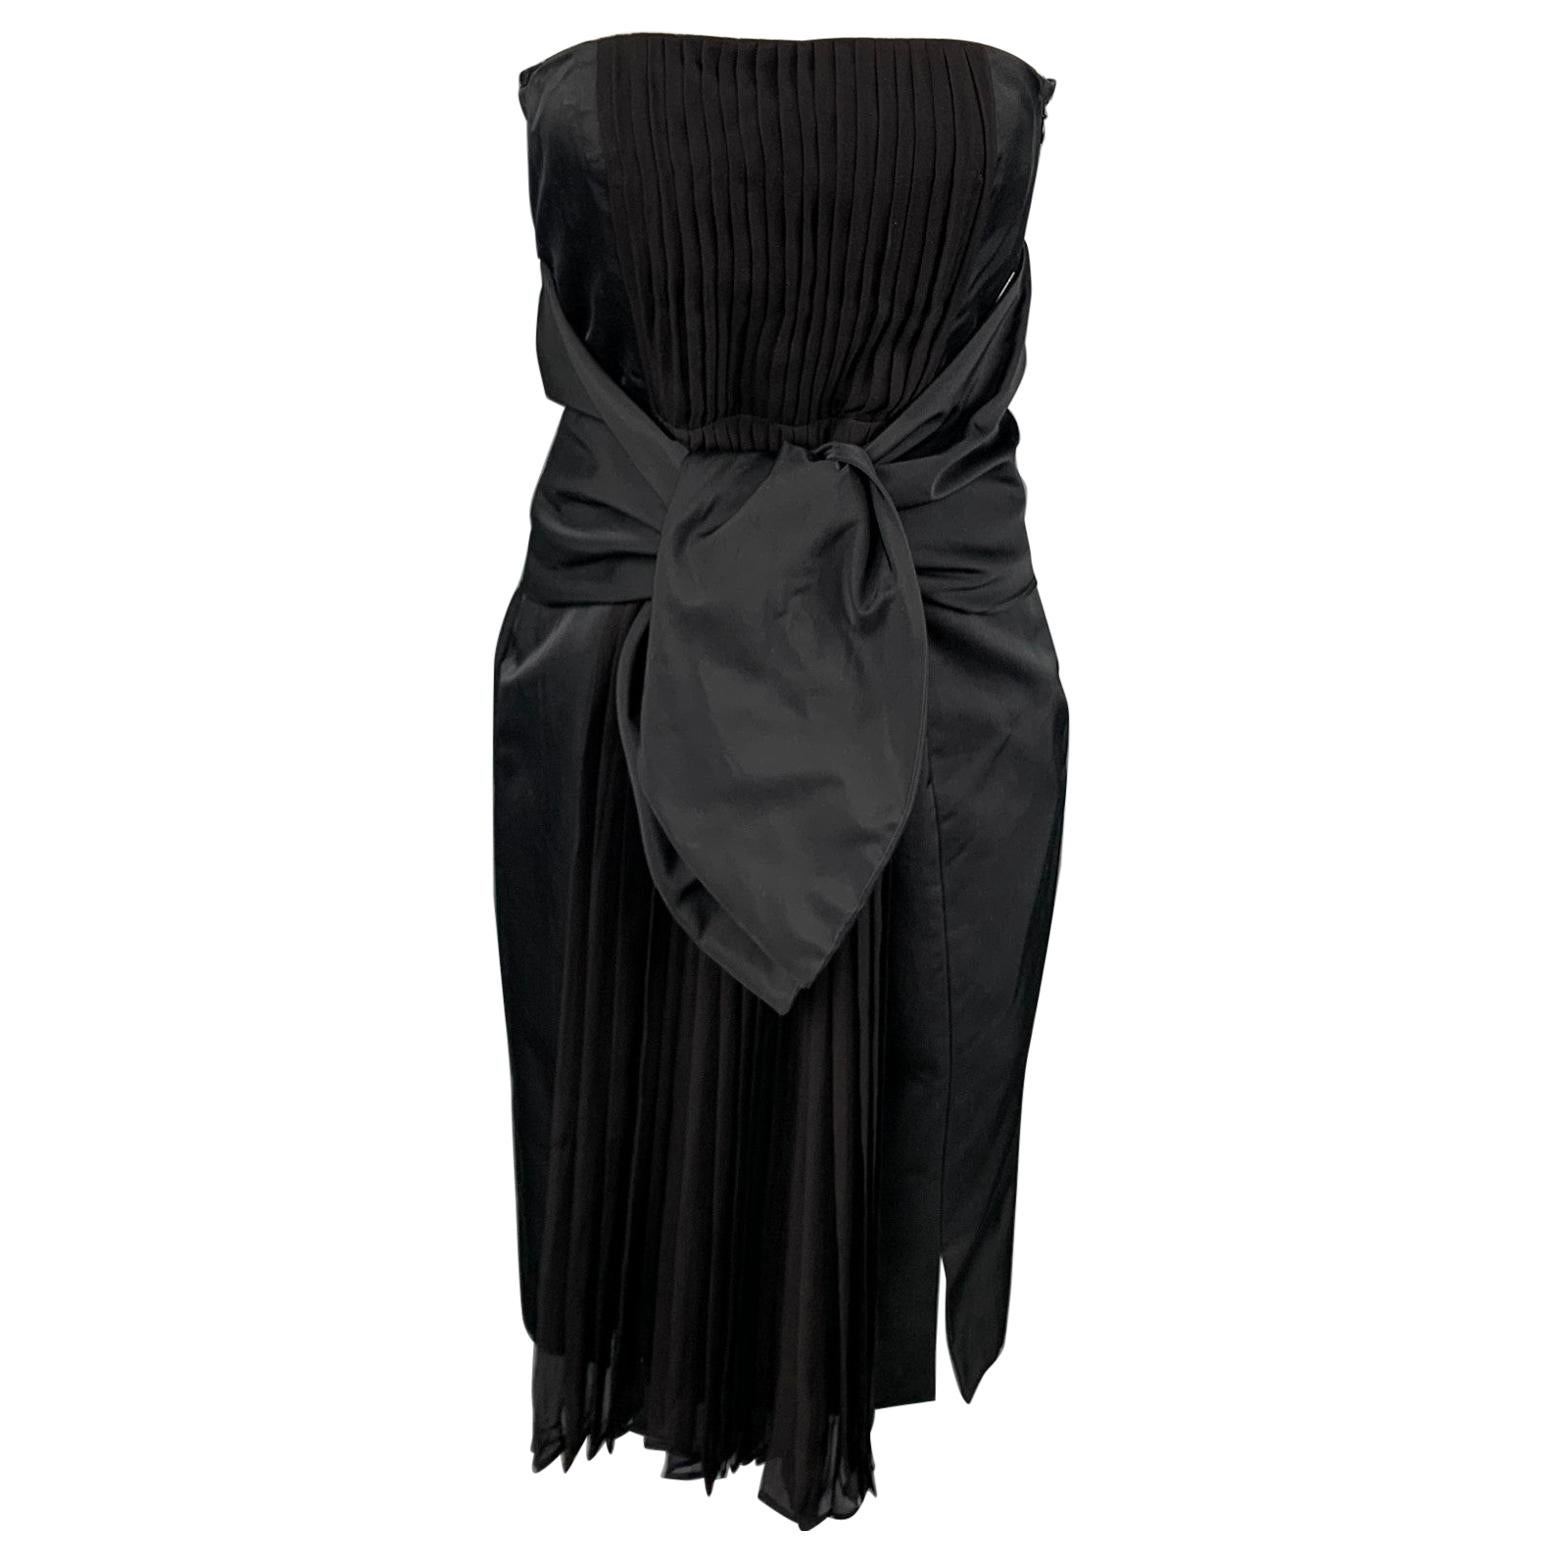 GIAMBATTISTA VALLI Size 6 Black Pleated Cotton / Silk Cocktail Dress